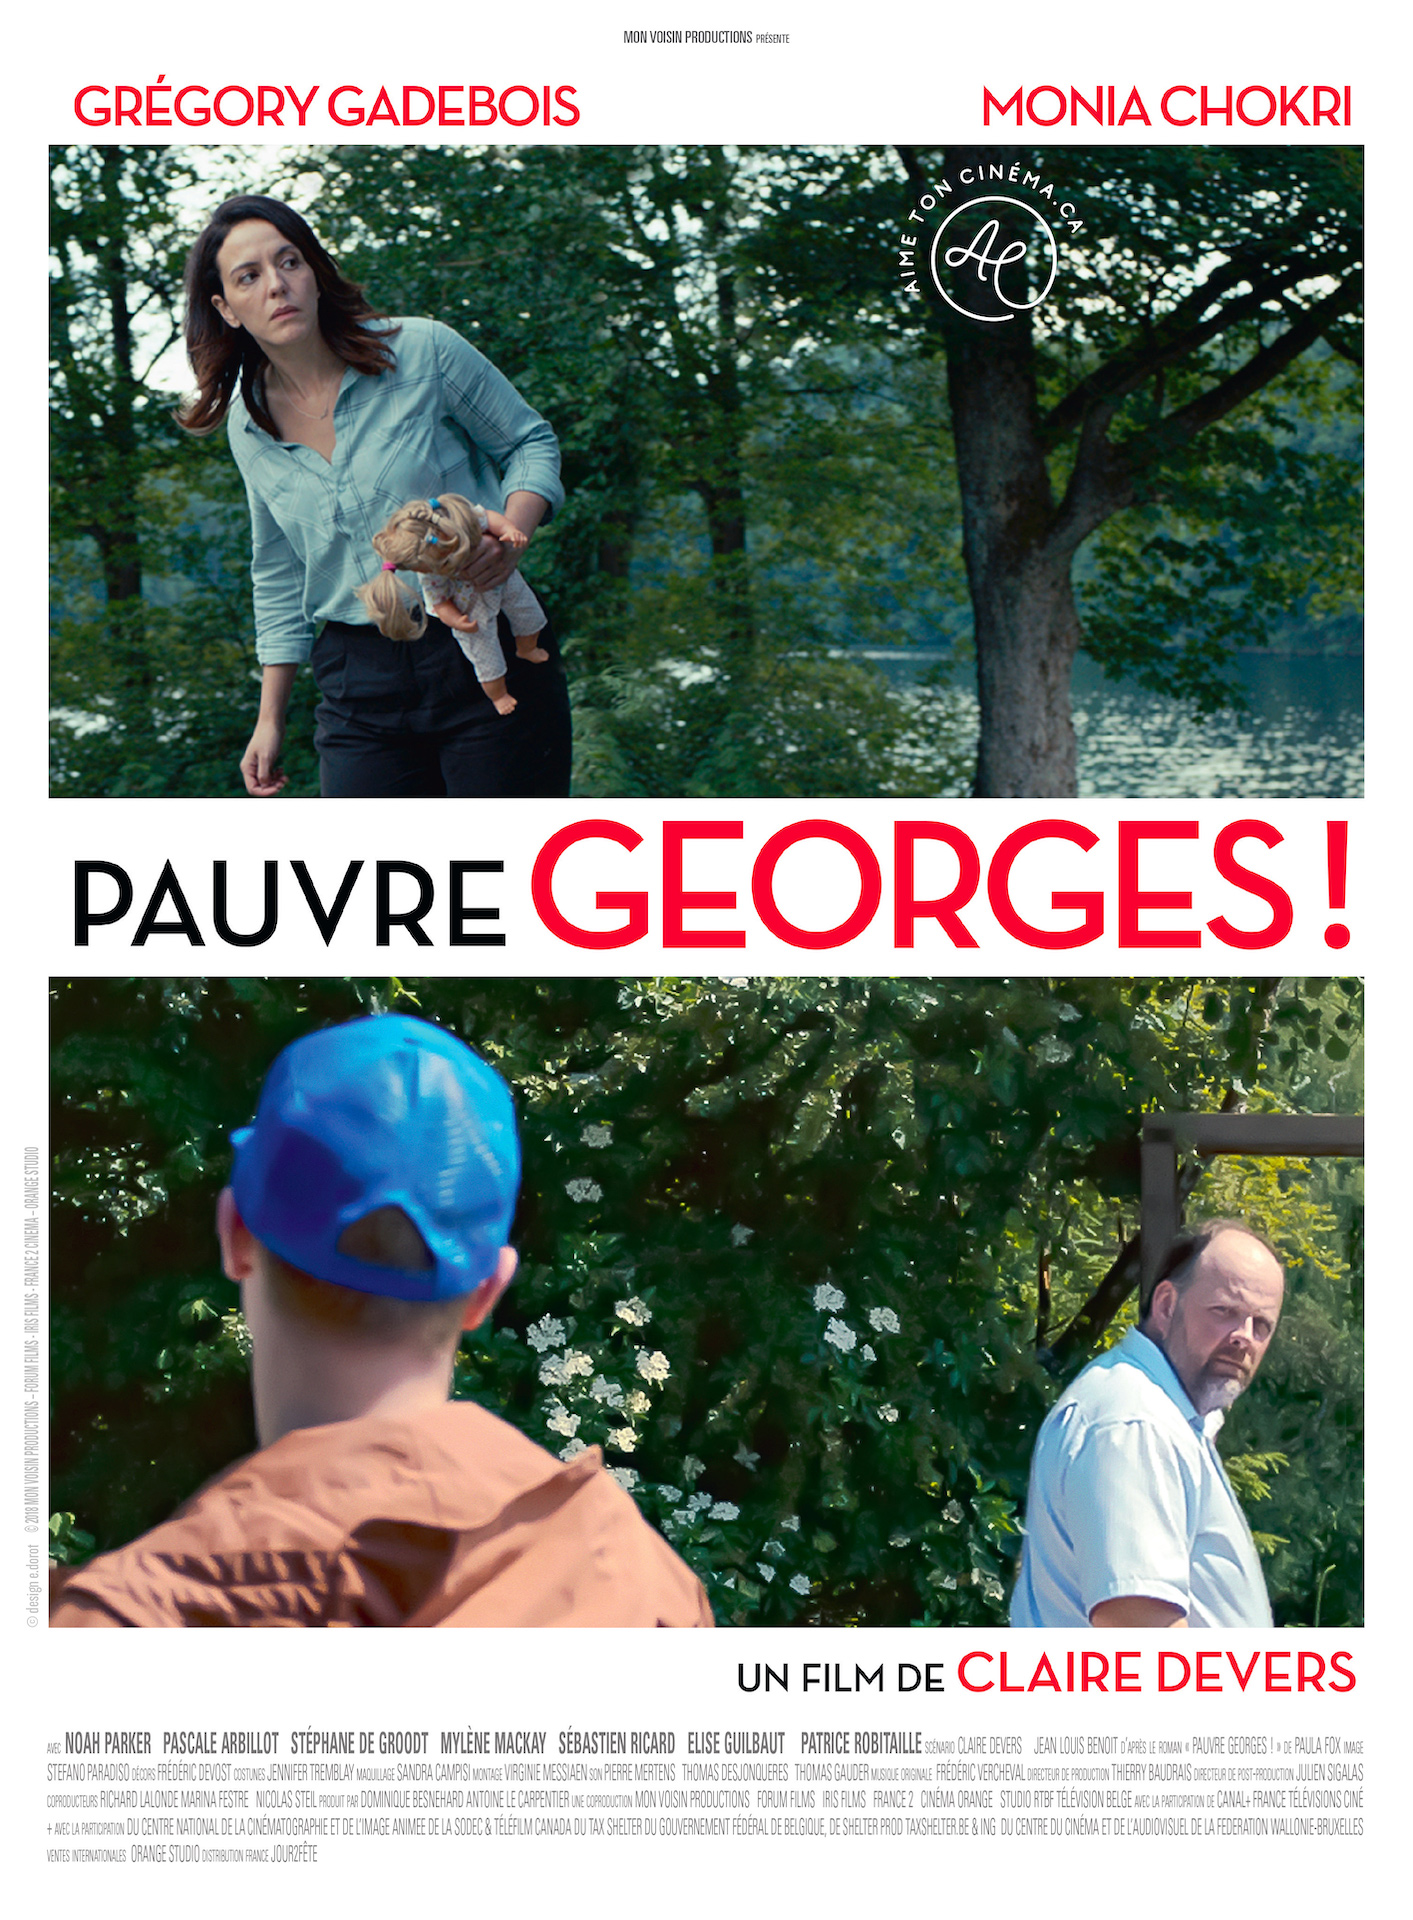 PAUVRE GEORGES